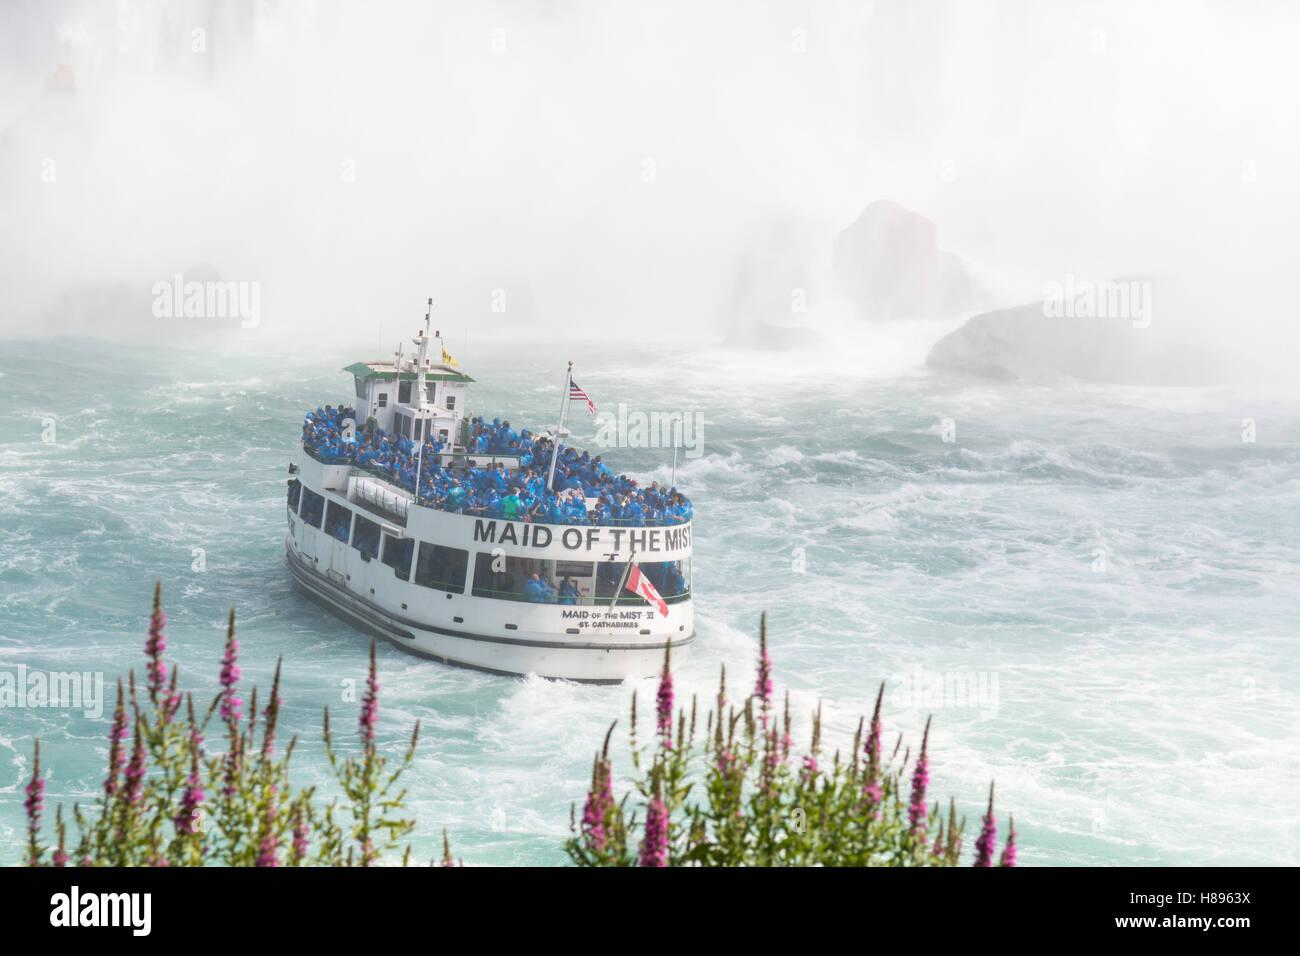 Maid of the Mist, Niagara Falls - Stock Image